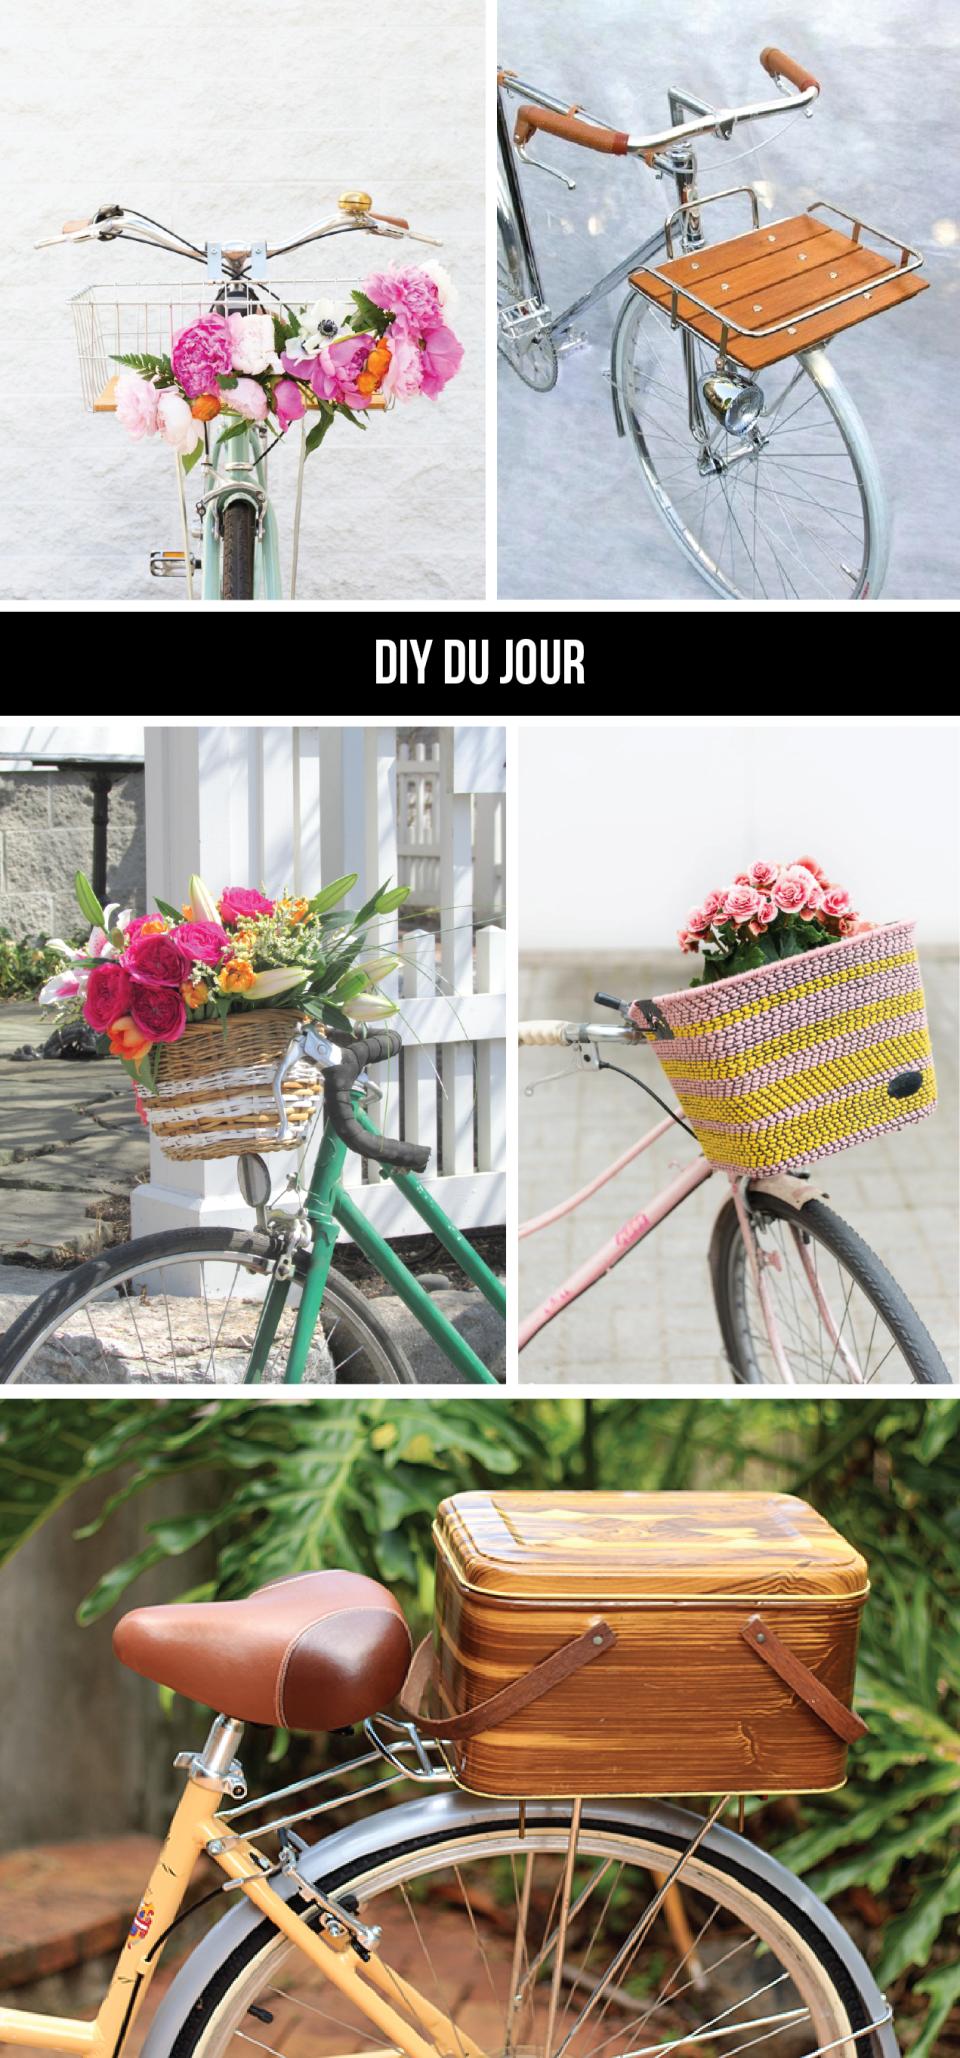 DIY du Jour: Bike Baskets to Pimp Your Summer Ride